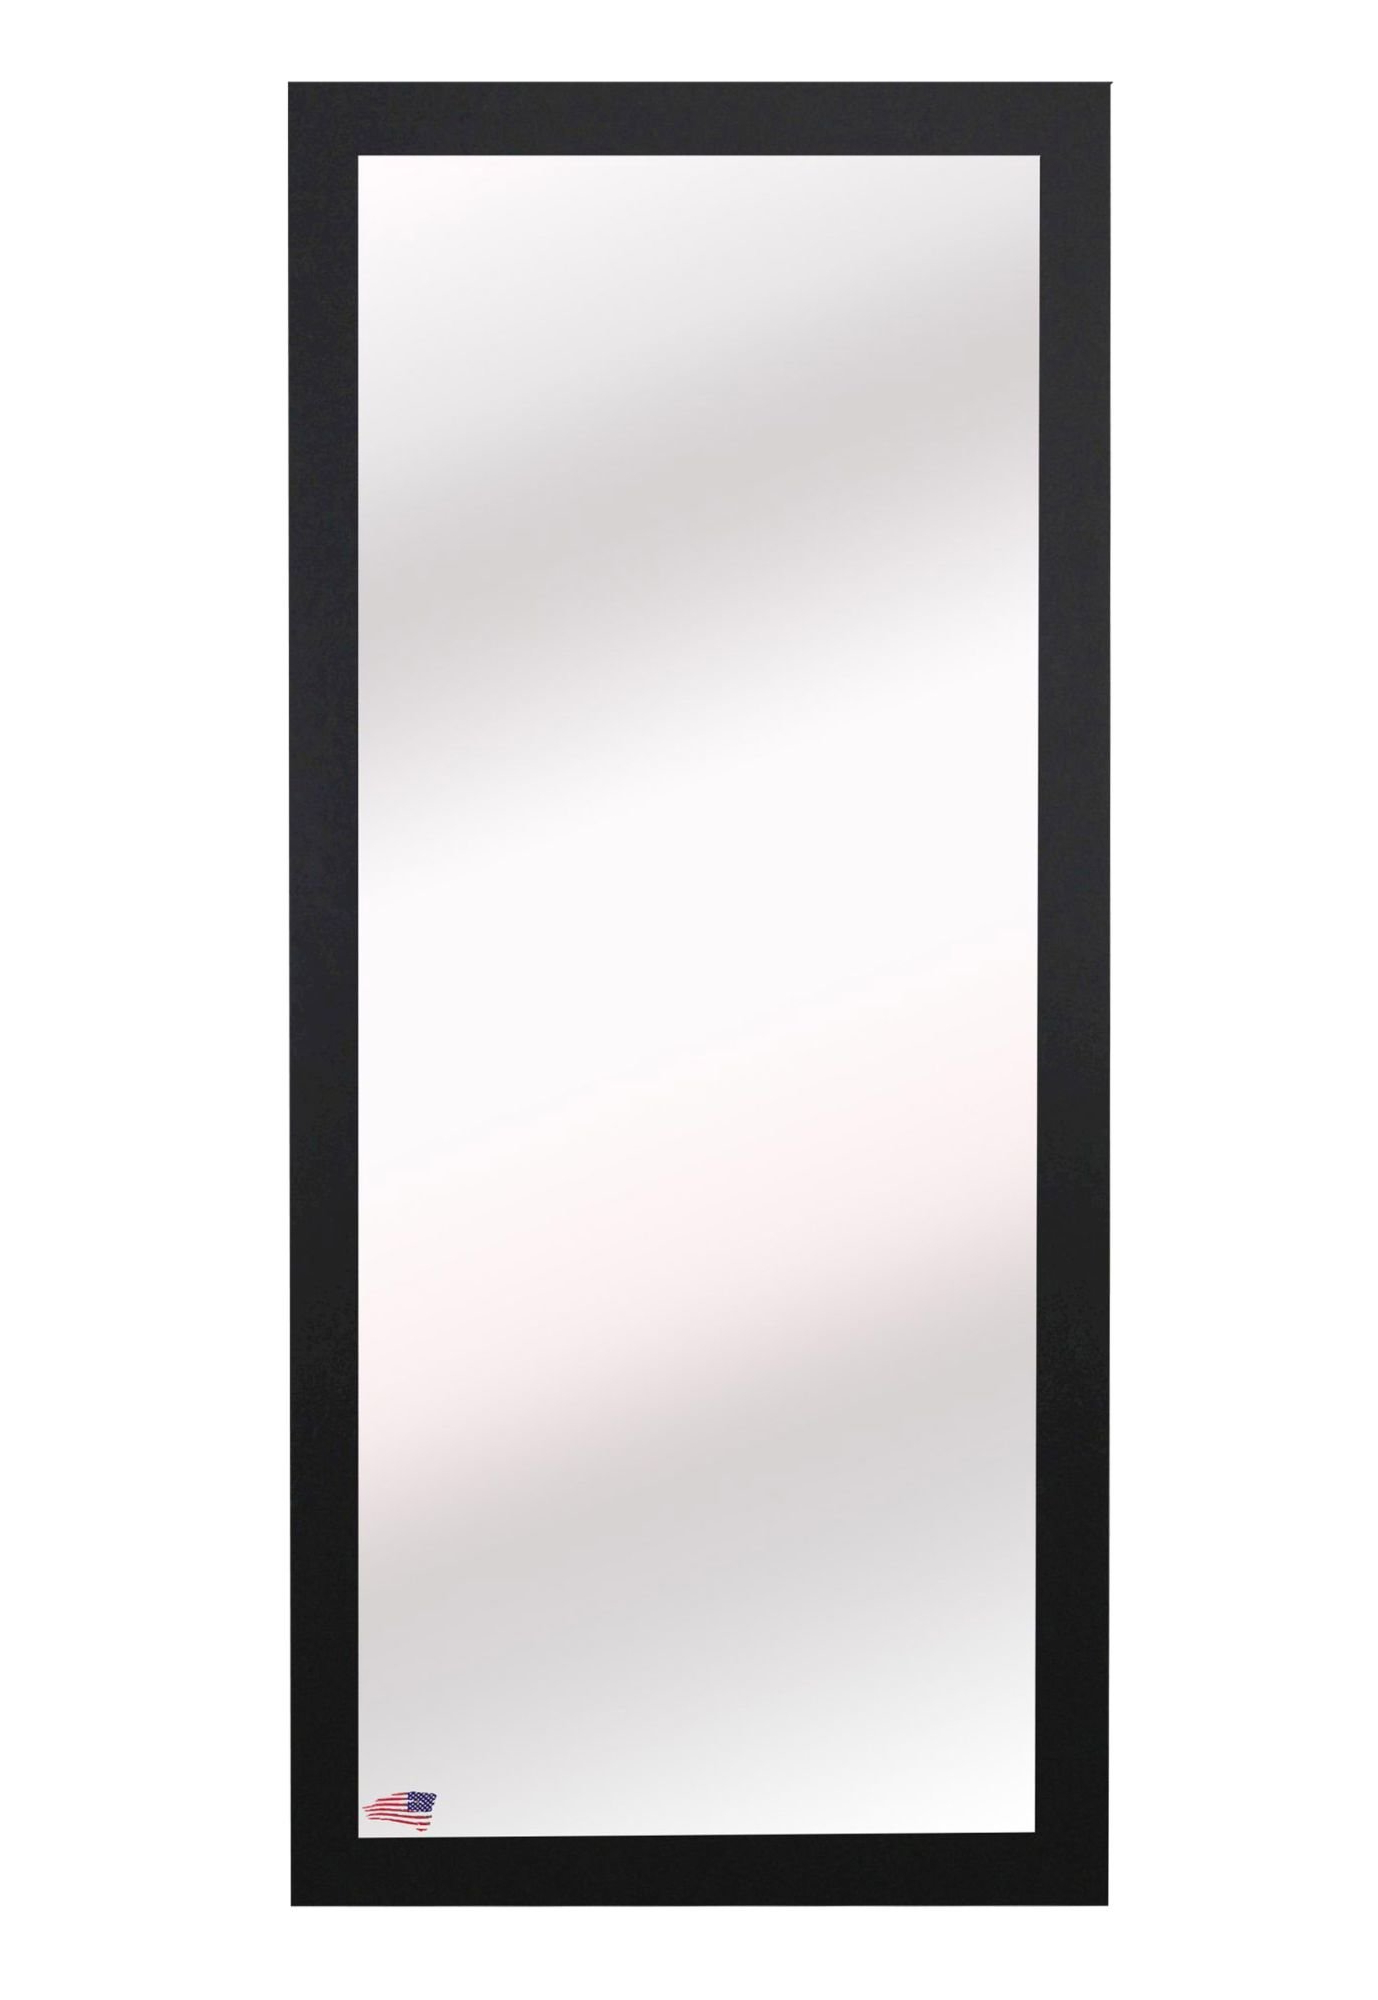 Recent Cheap Full Length Wall Mirrors Regarding Latitude Run Rectangle Black Full Length Wall Mirror & Reviews (View 7 of 20)